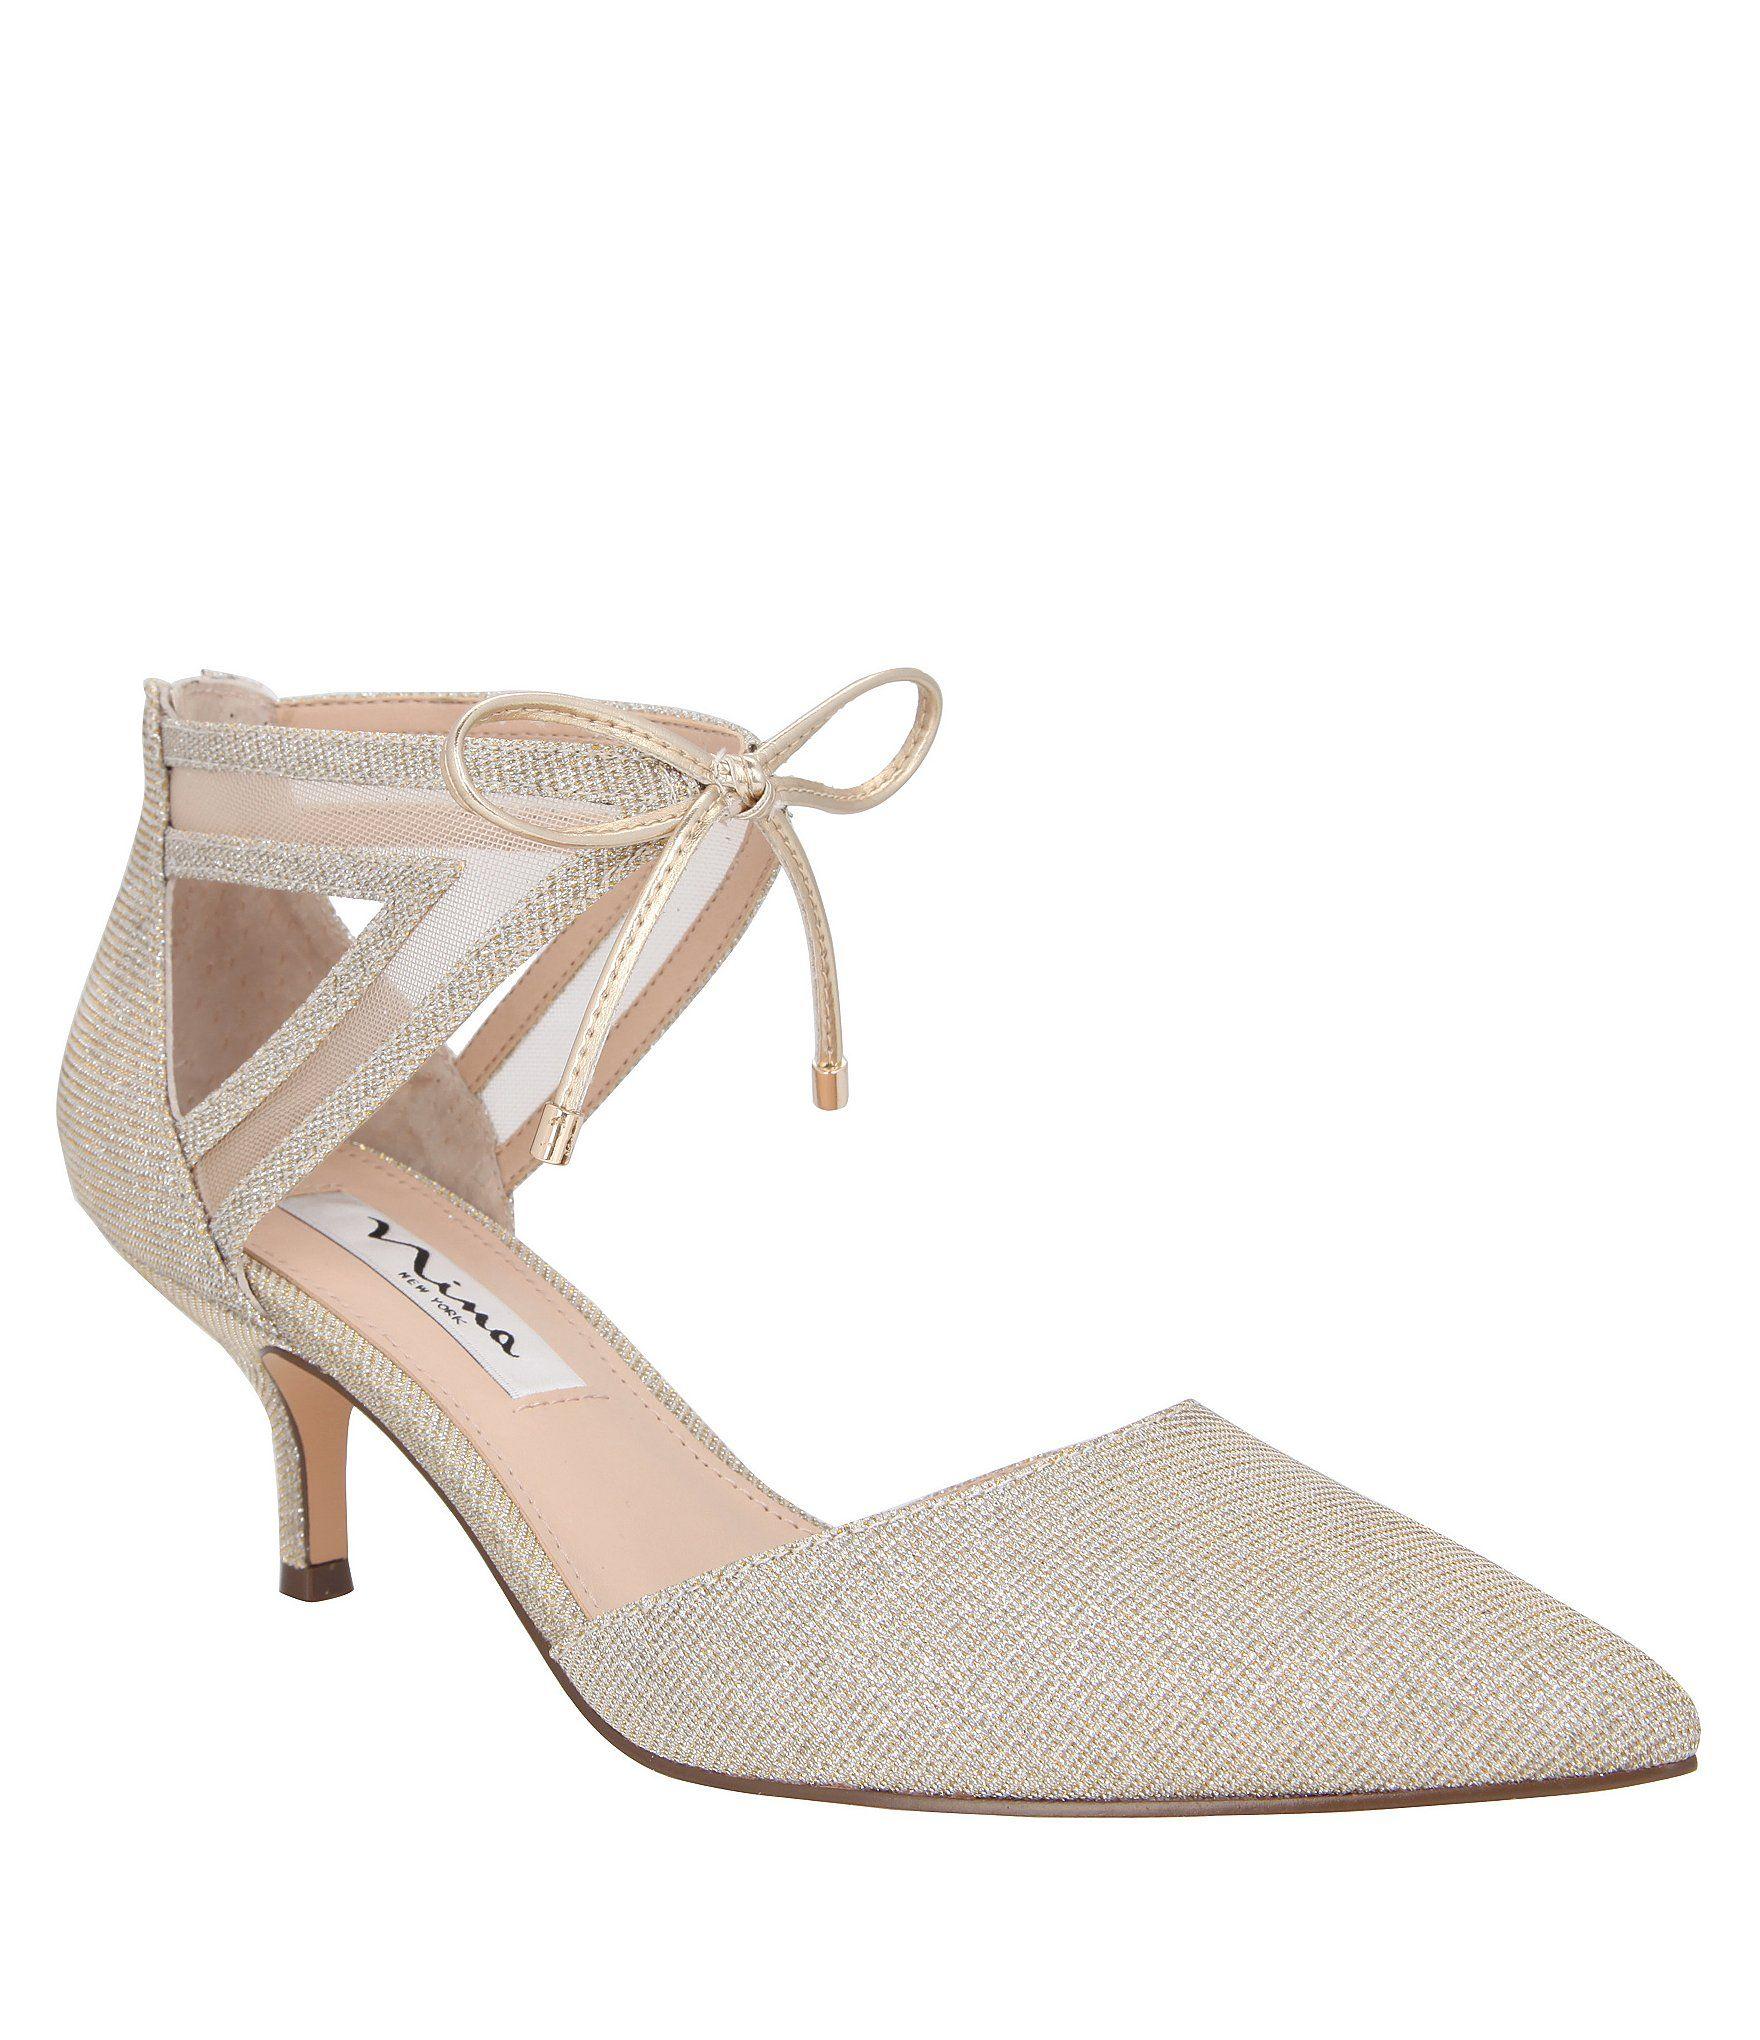 Dillards Wedding Gifts: Shop For Nina Talley Metallic Fabric Ankle Tie Dress Pumps